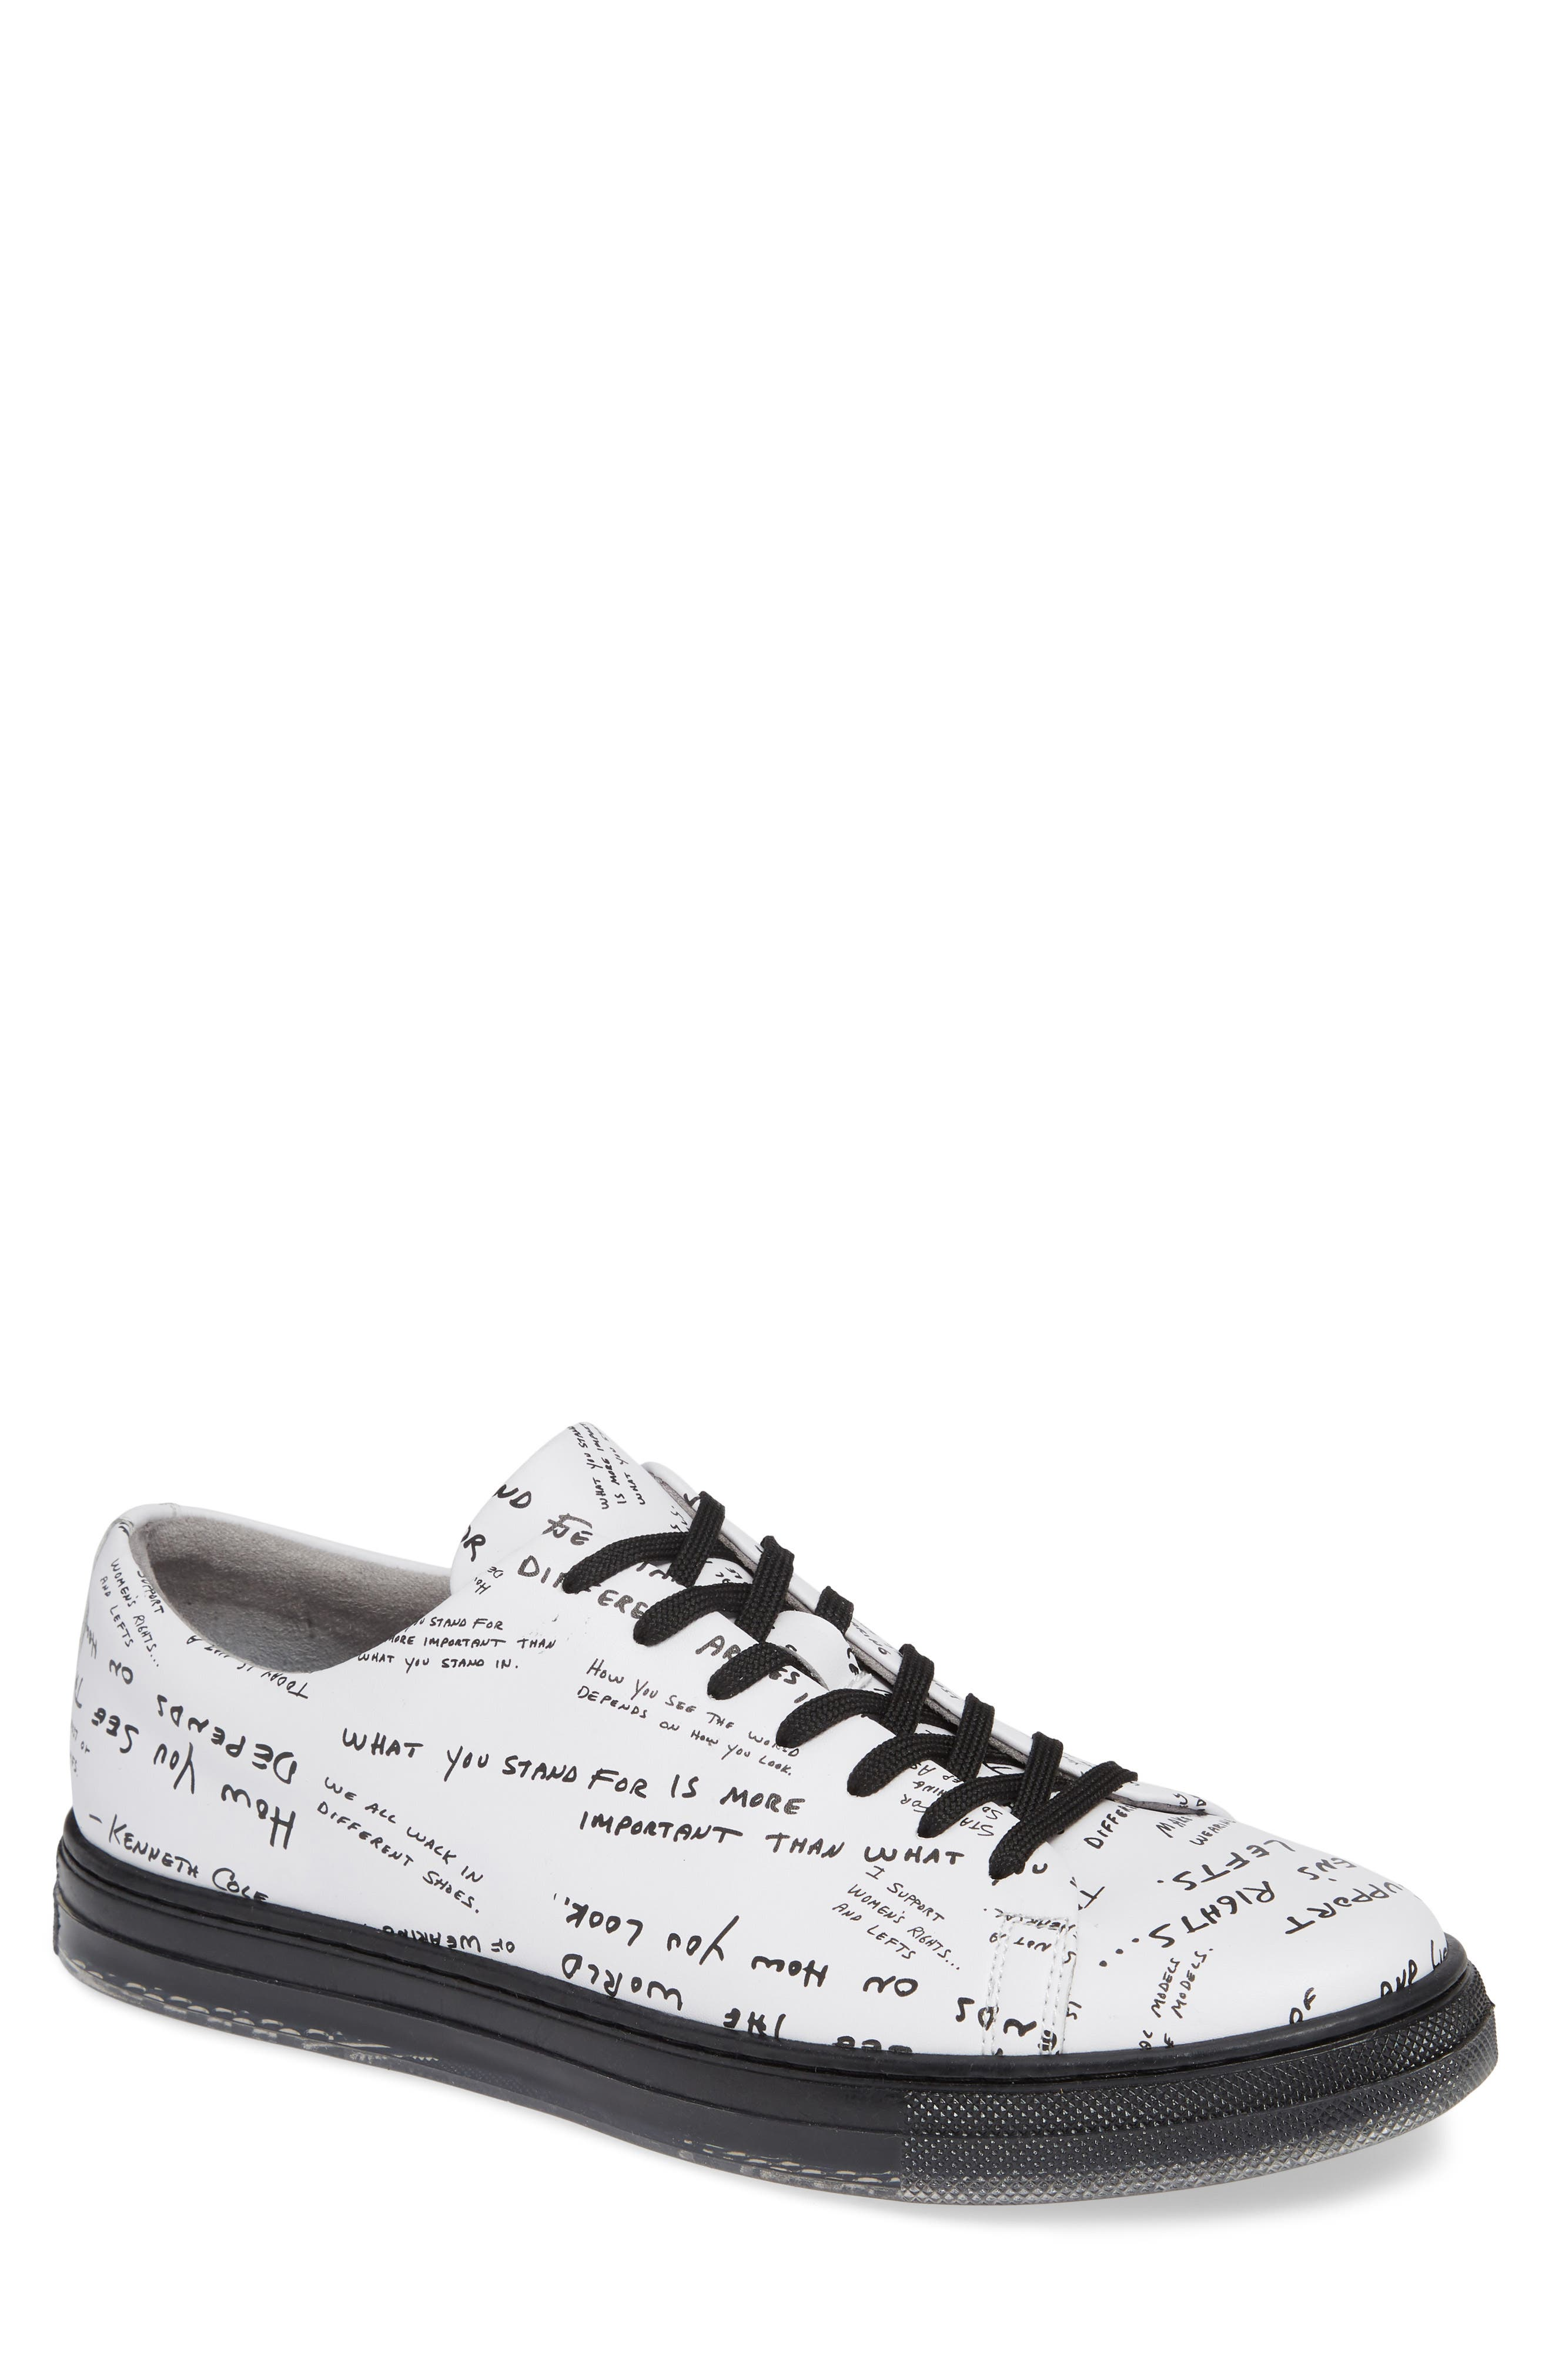 Colvin Low Sneaker,                             Main thumbnail 1, color,                             110